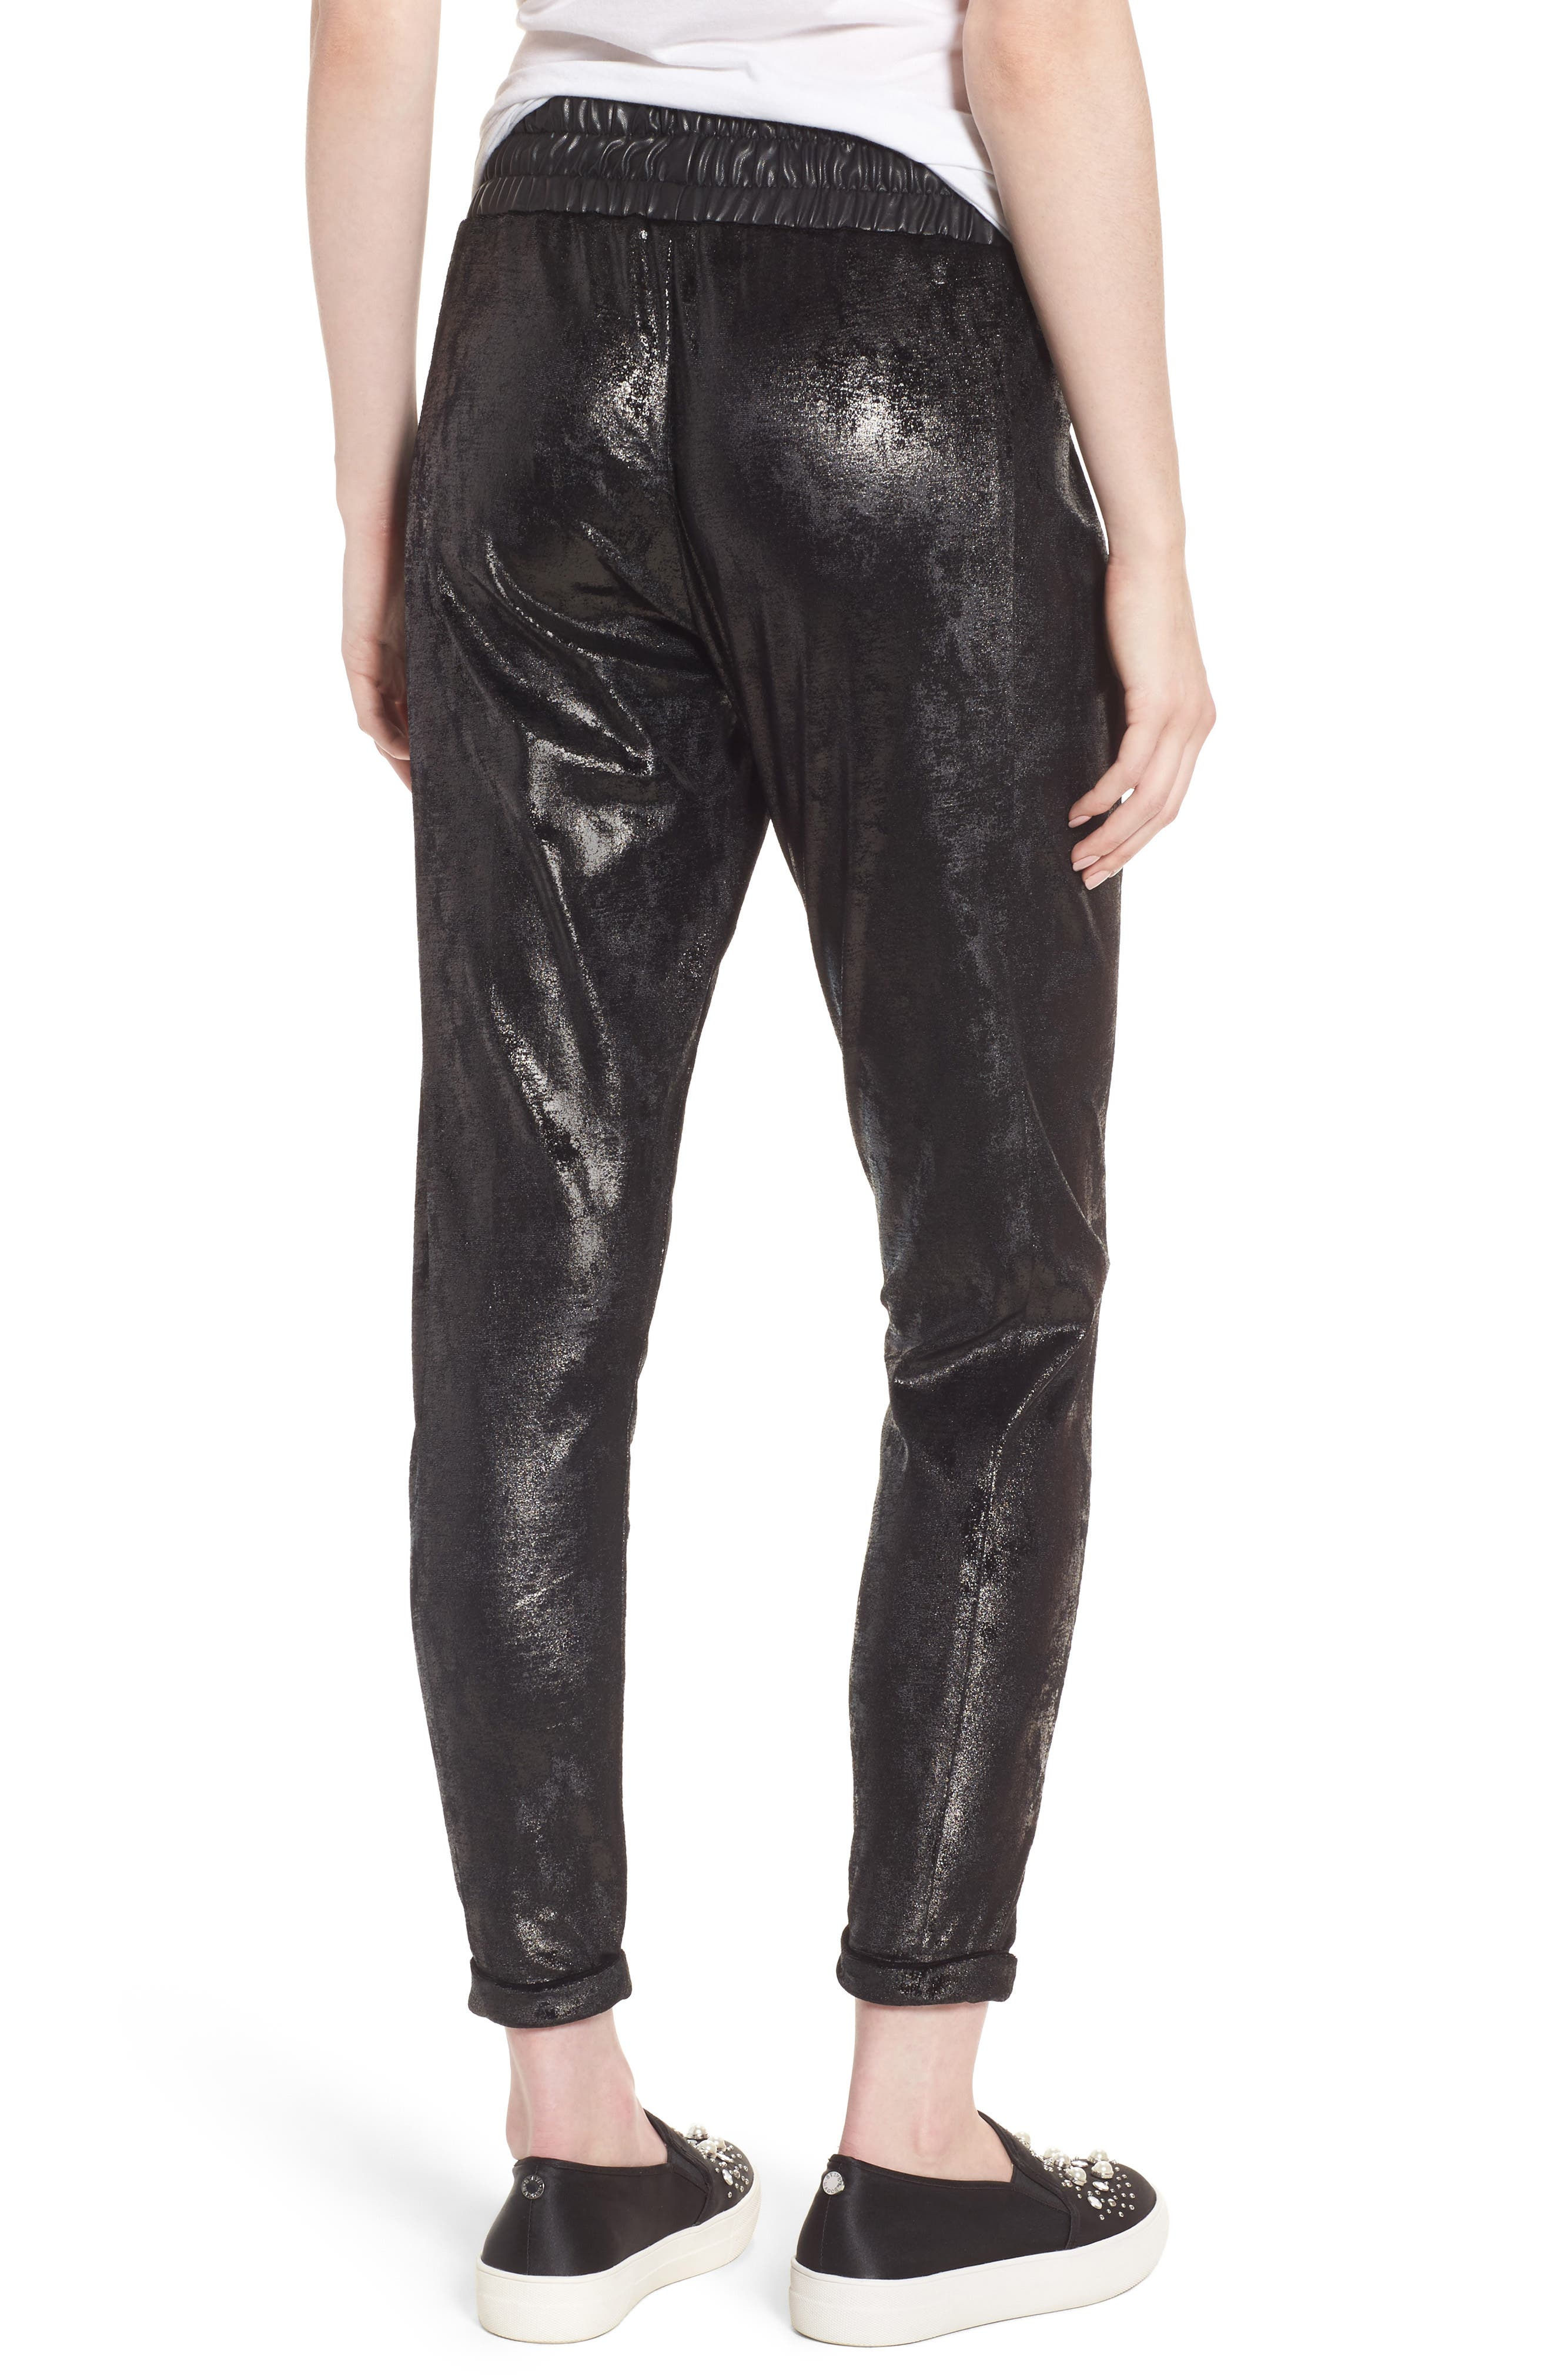 Randall Cuffed Sweatpants,                             Alternate thumbnail 2, color,                             Black